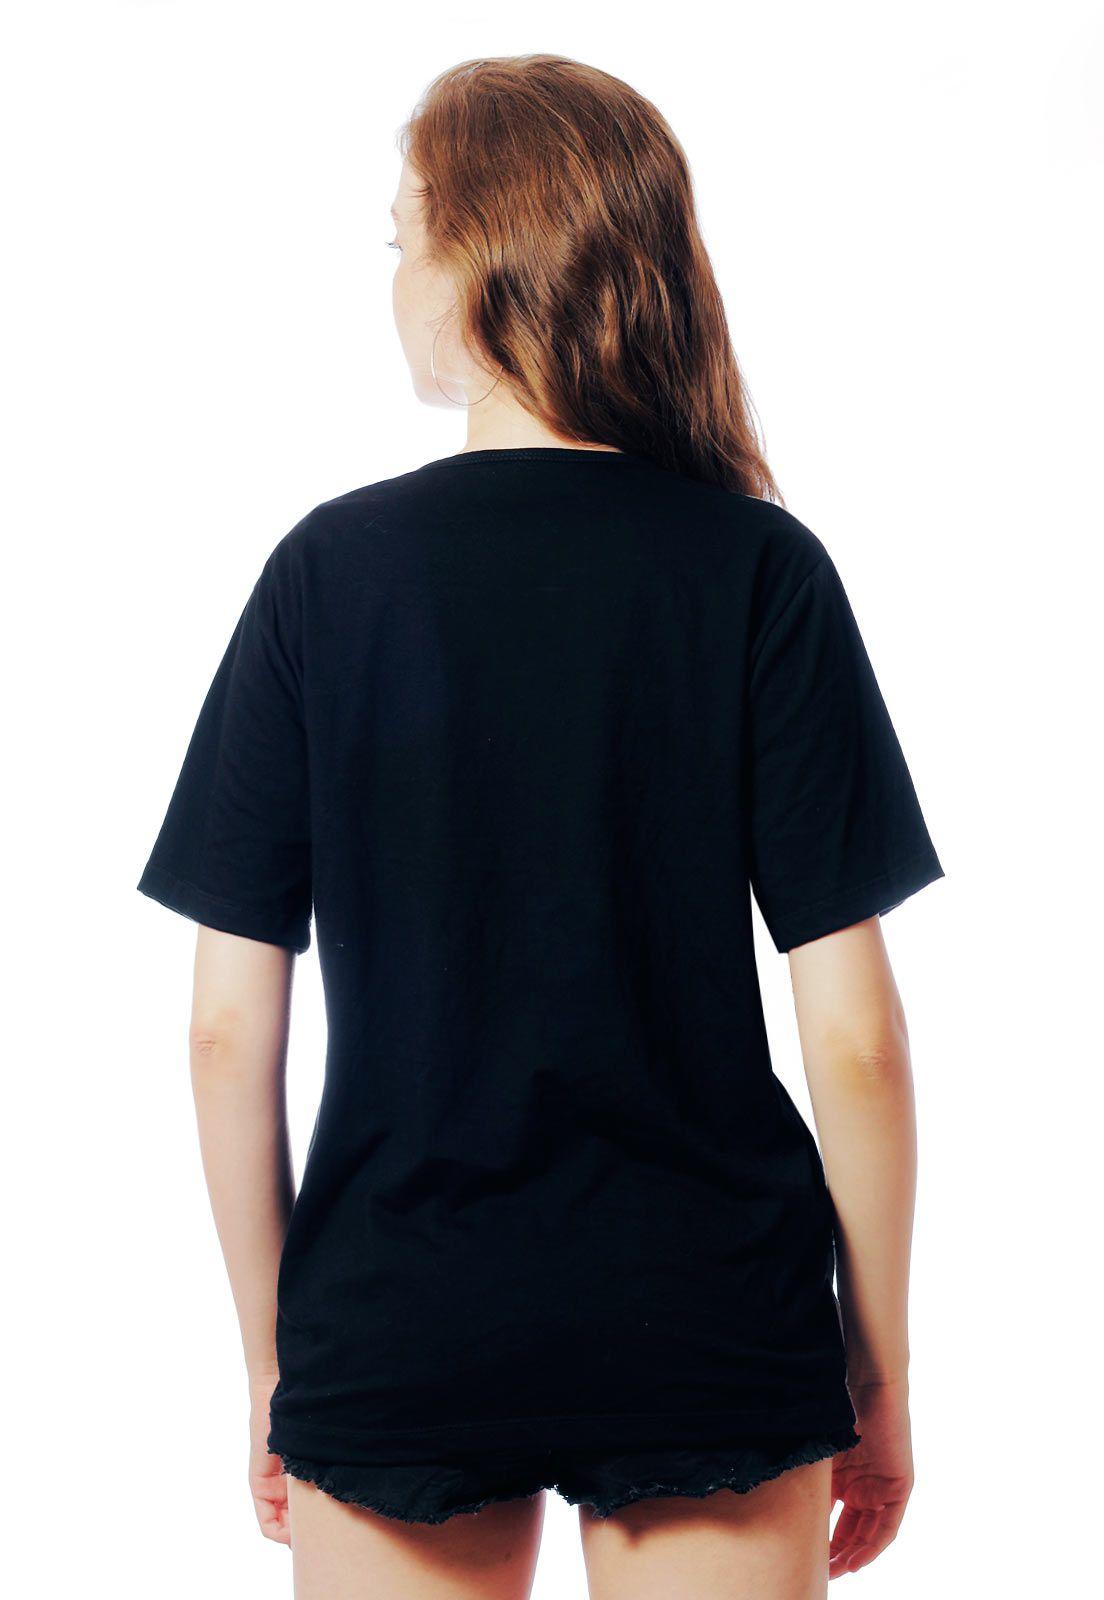 Camiseta ElephunK Estampada México Neon Mexicana Preta